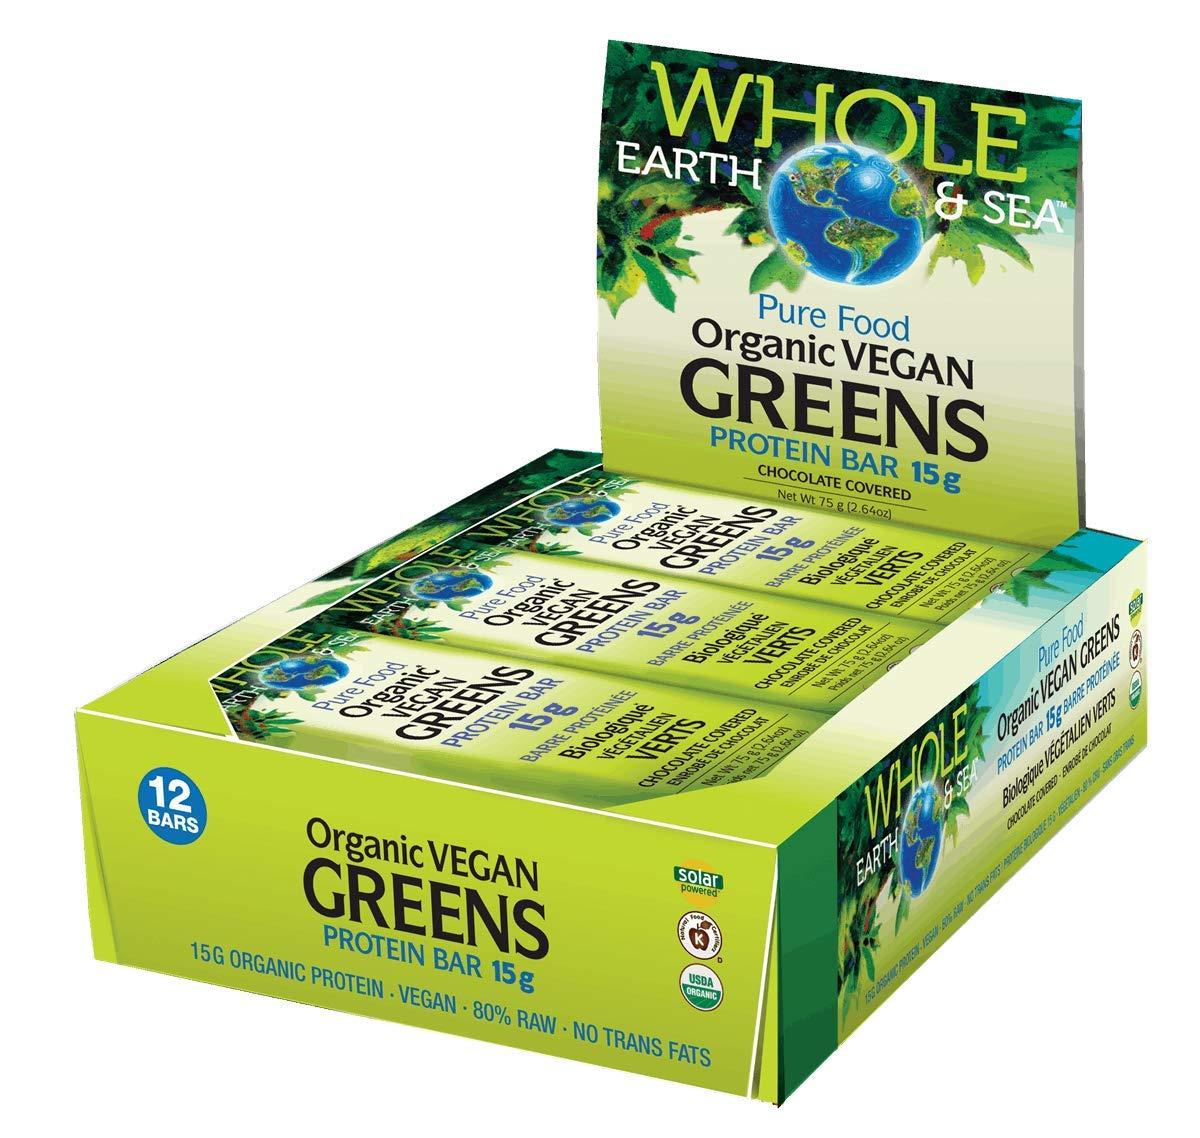 Organic Vegan Greens Protein Bar Chocolate Covered (12 Bars)